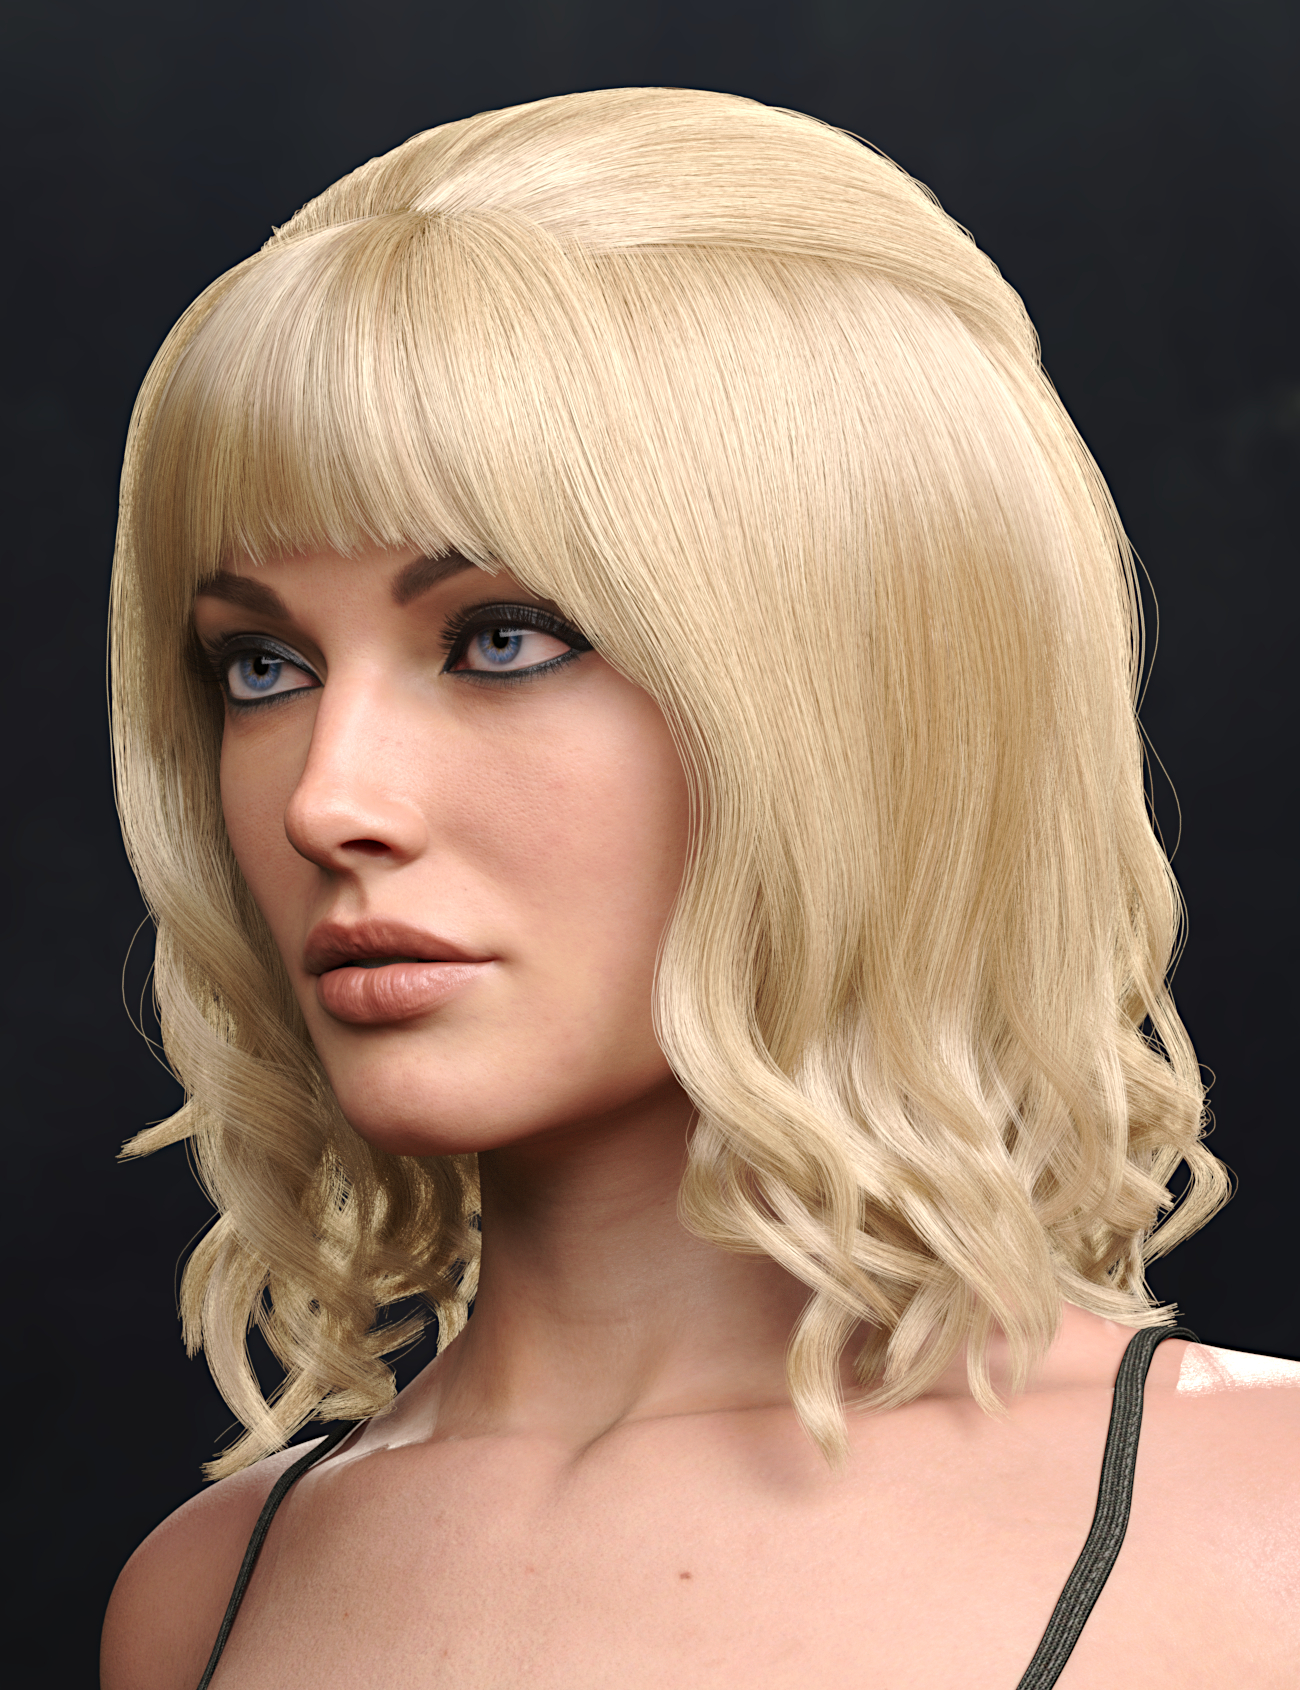 Brigit Hair for Genesis 8 and 8.1 Females by: Toyen, 3D Models by Daz 3D